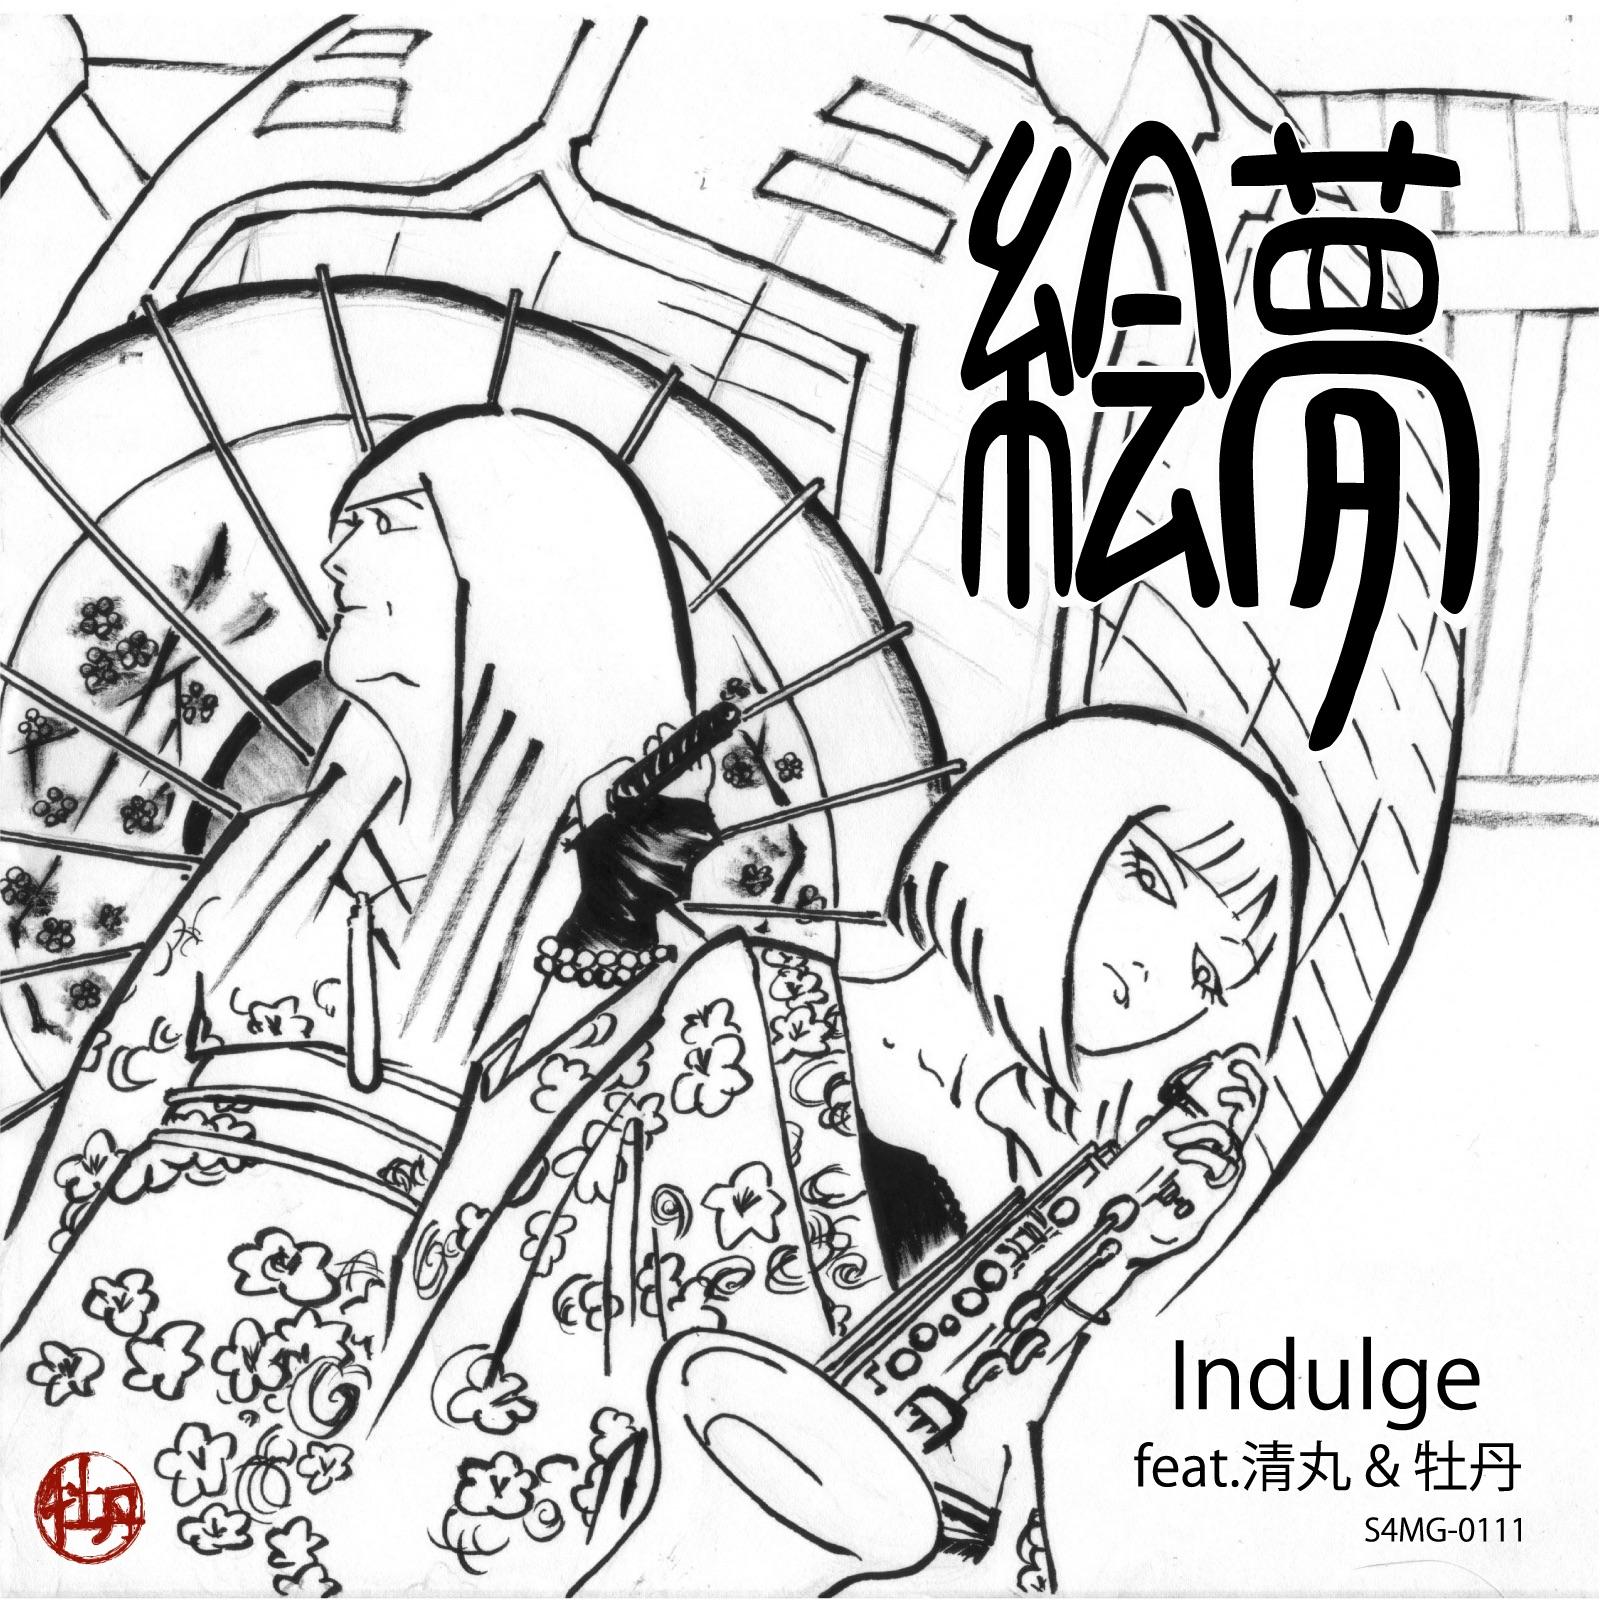 Indulge - Single